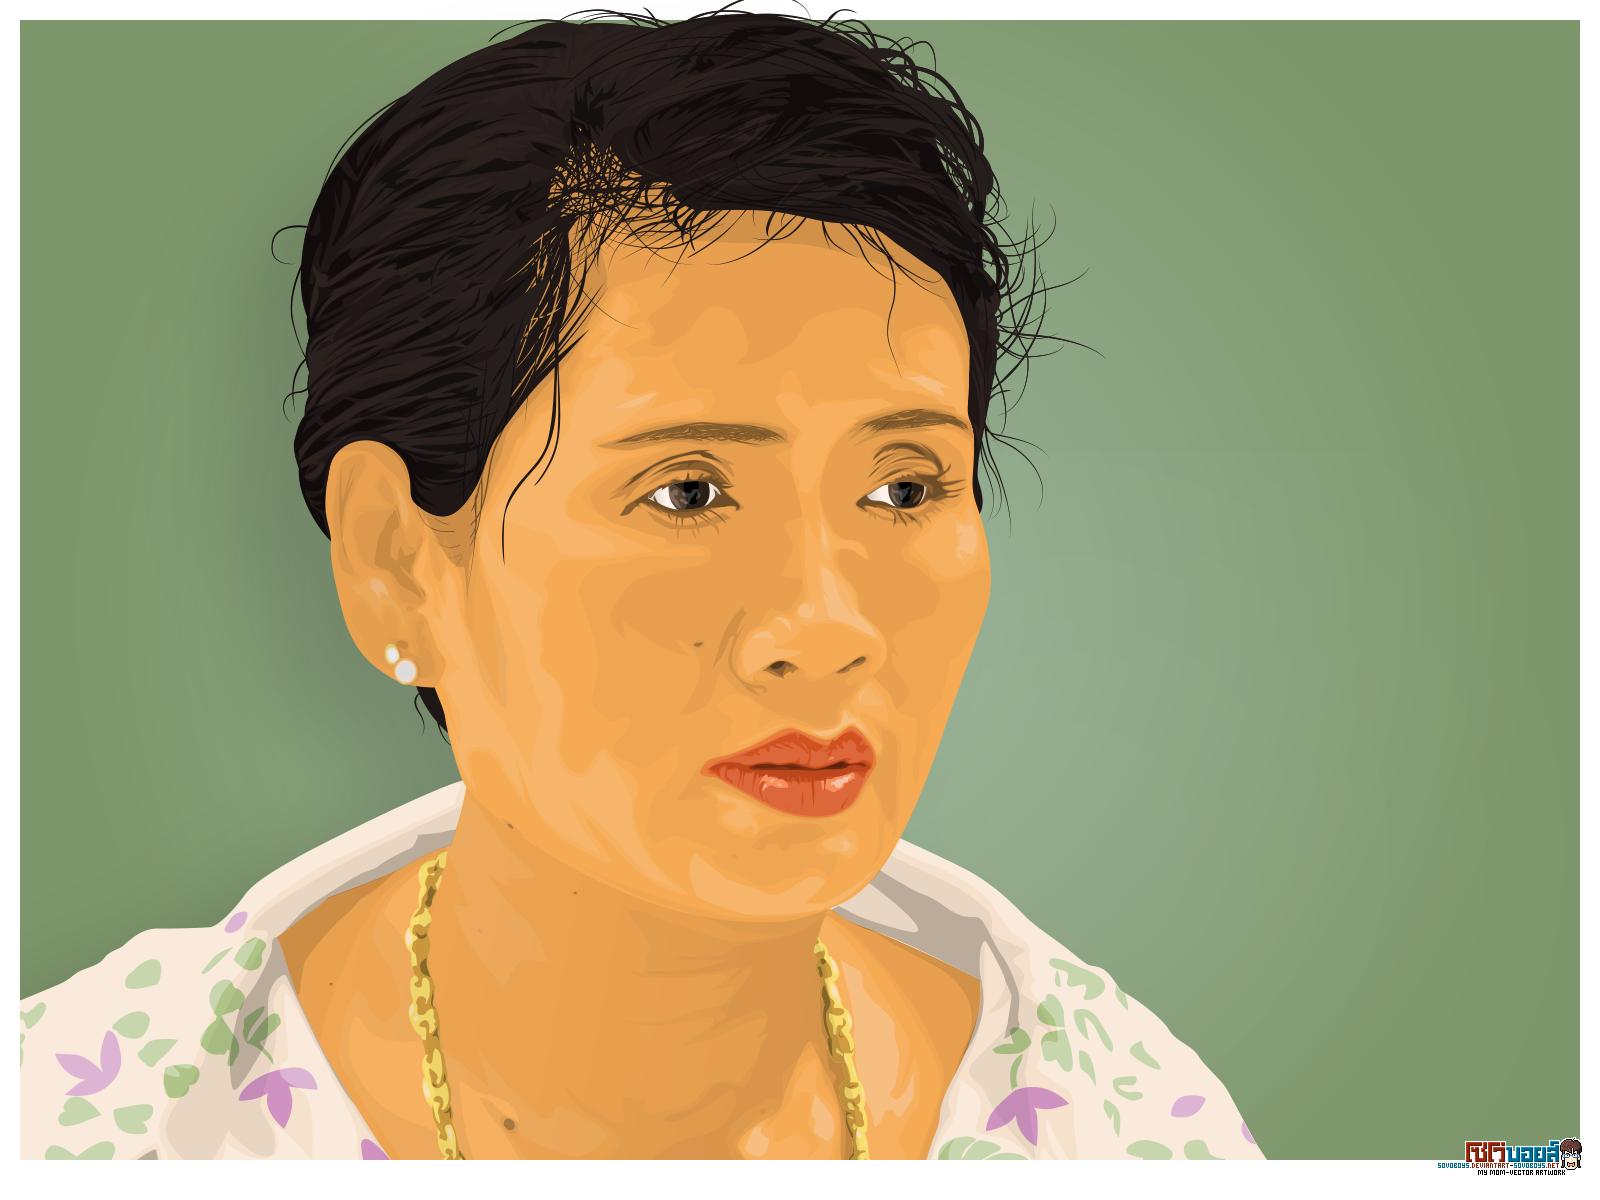 My mom - Vector artwork